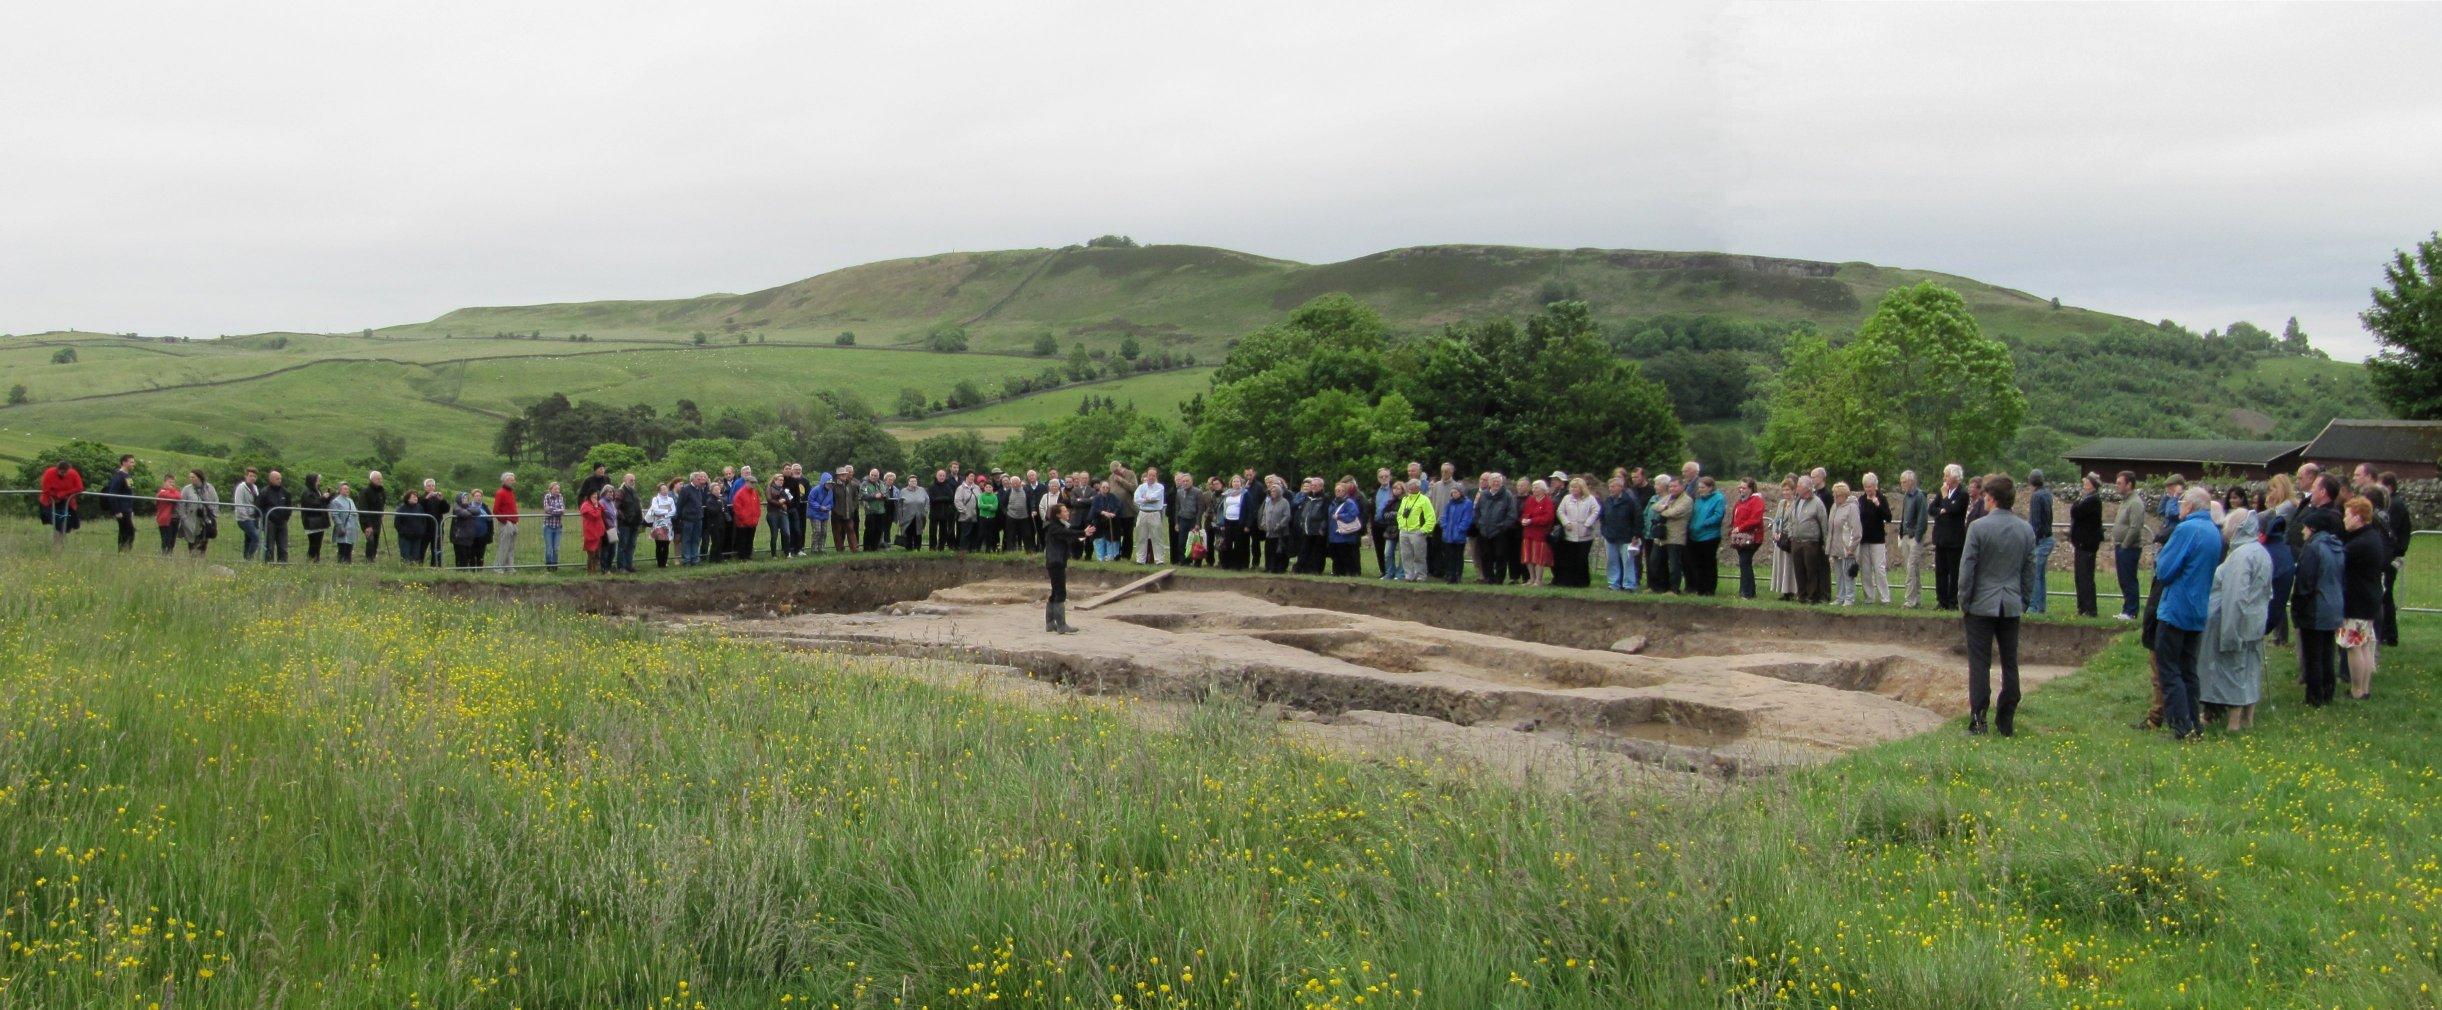 Beth_s_talk_on_the_North_Field_excavations.jpg